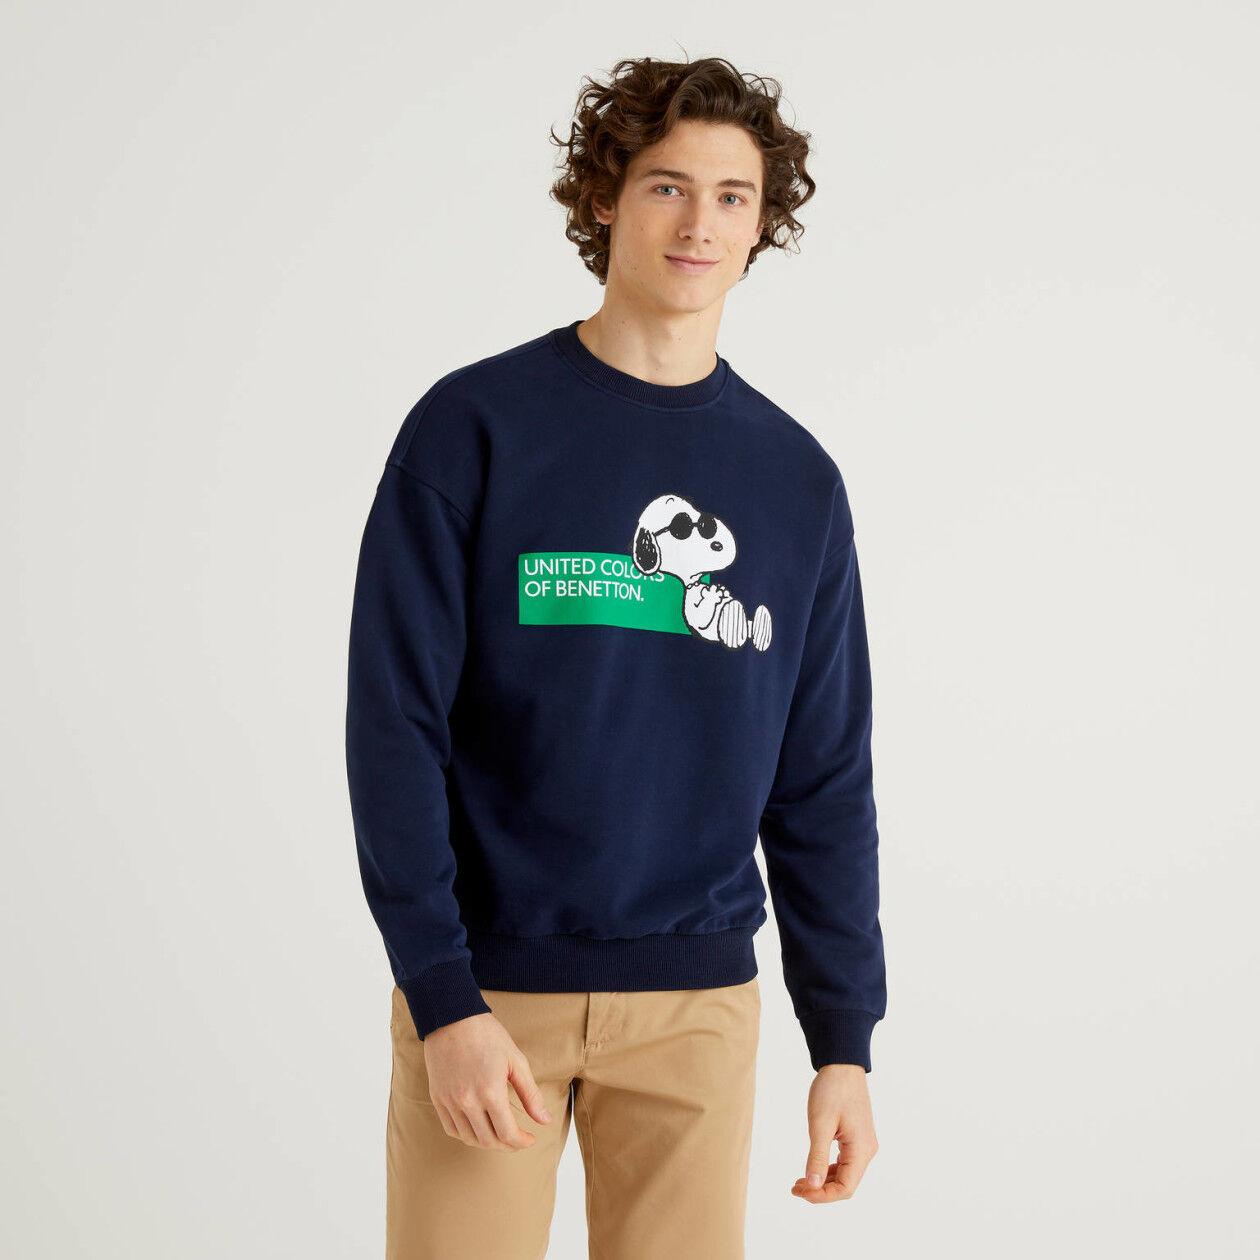 Peanuts sweatshirt in 100% organic cotton